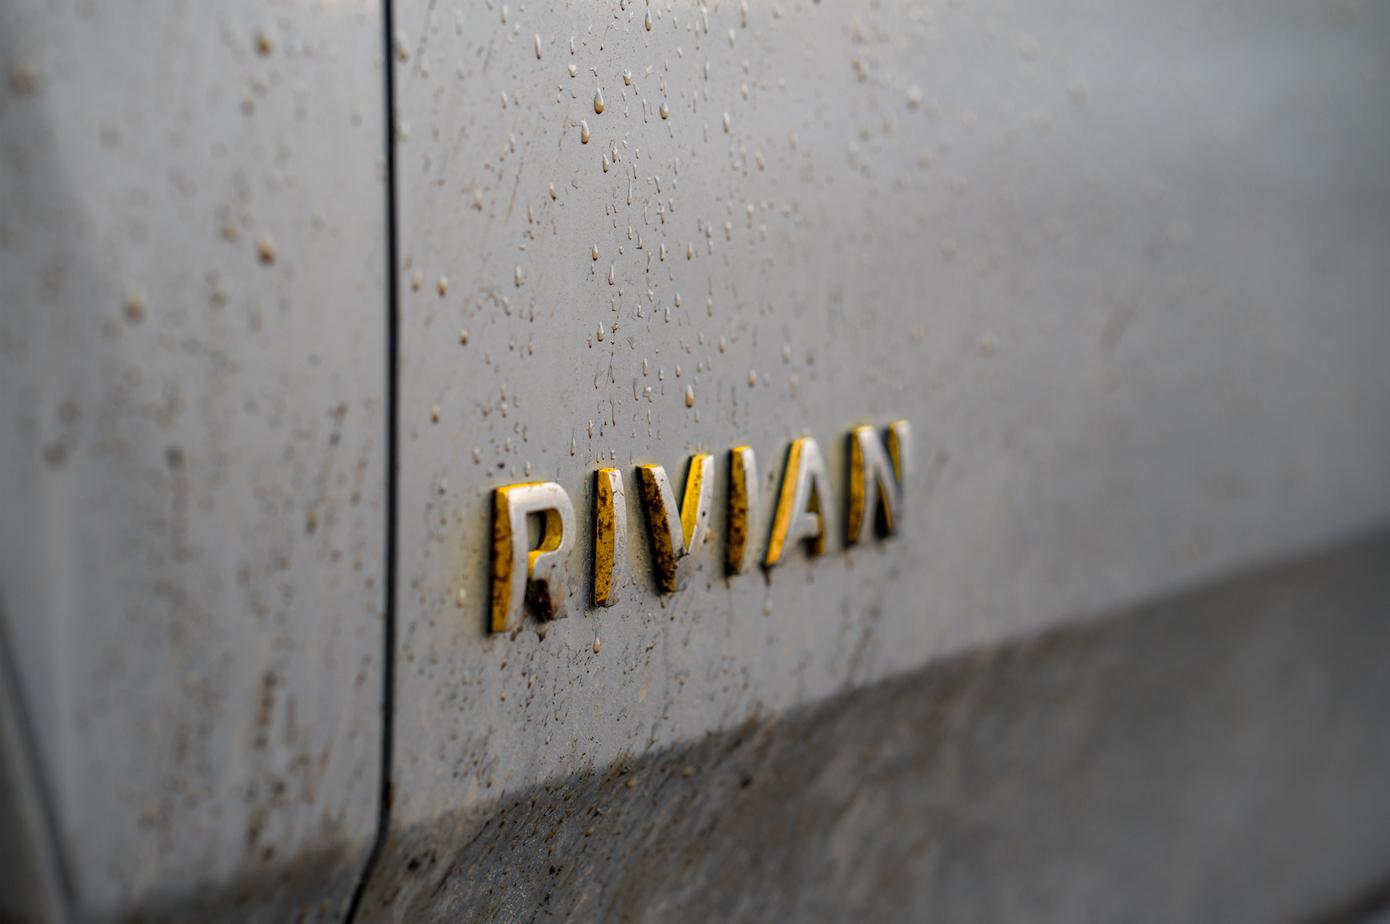 Rivian automaker badge